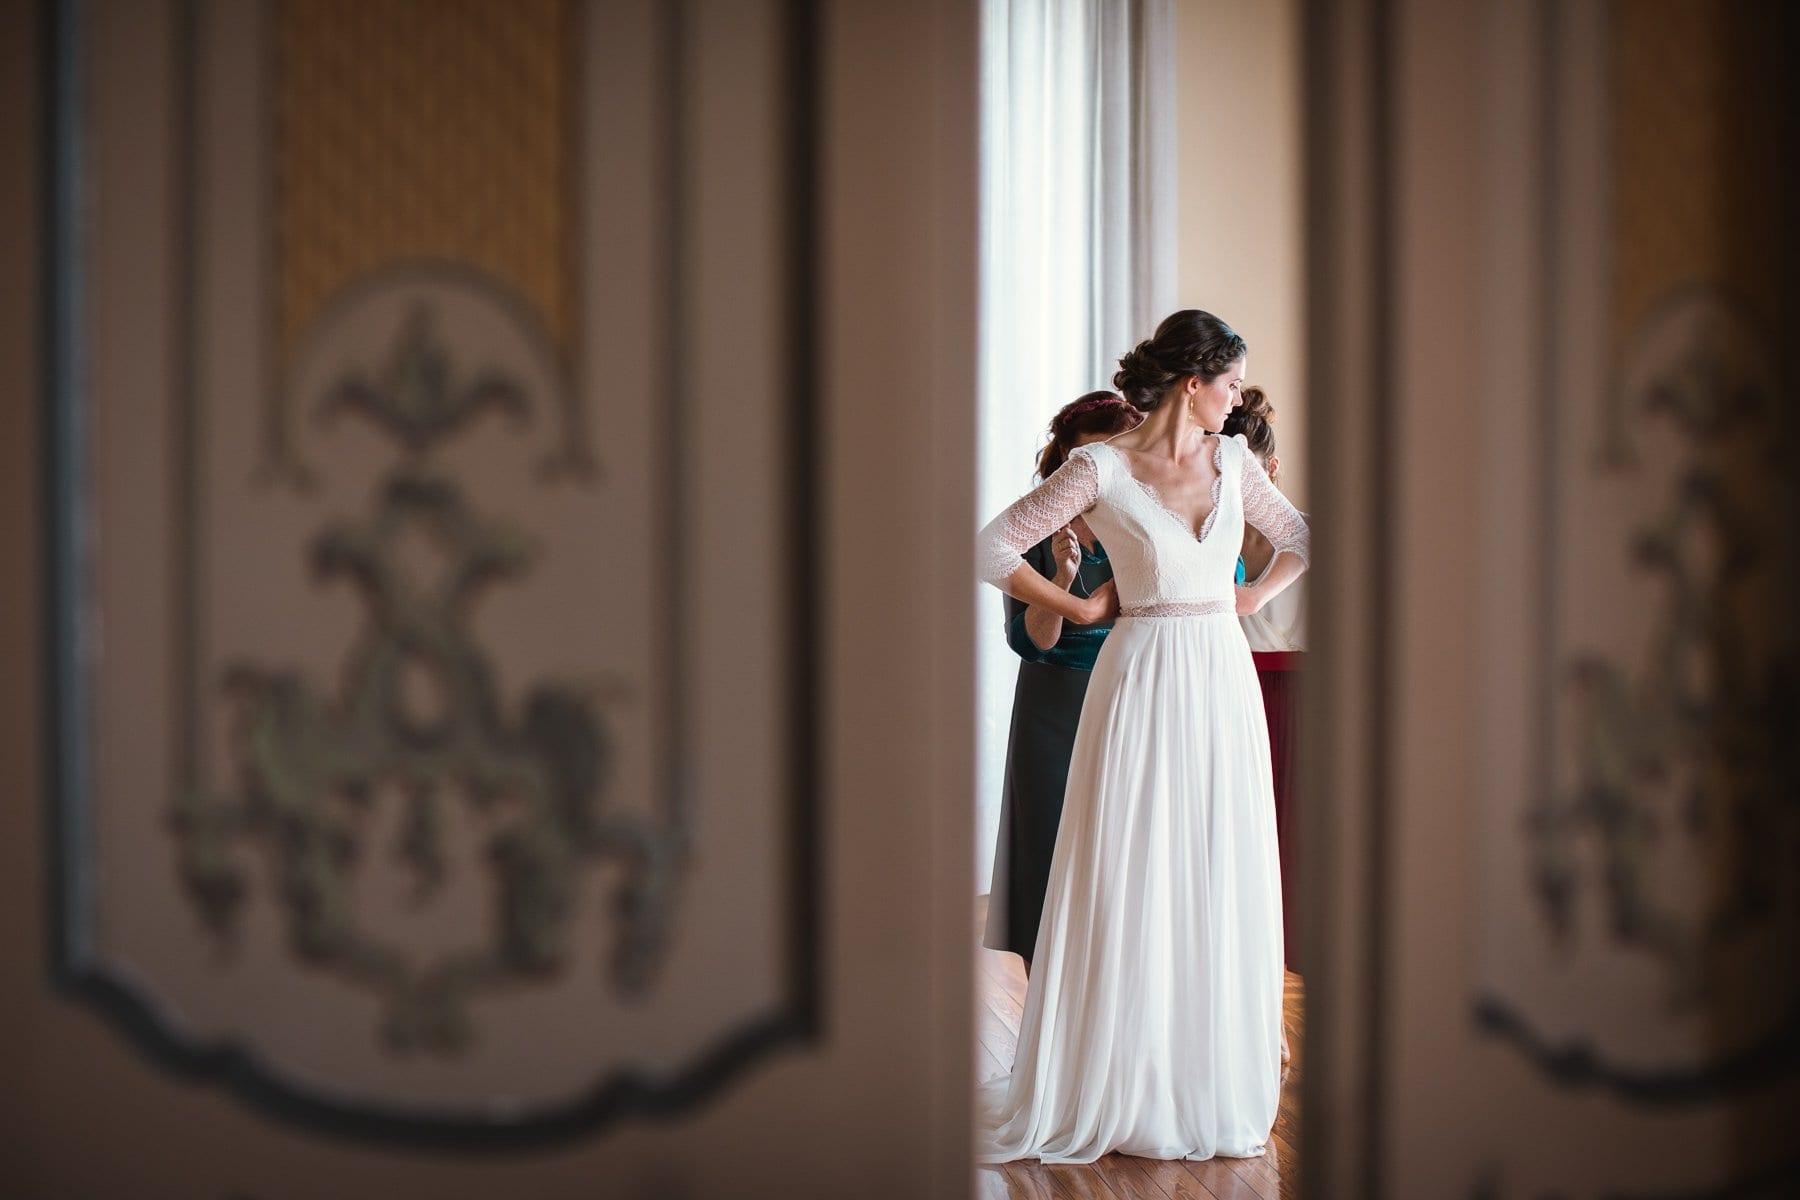 Foto matrimonio Villa Montalbano Varese - Alessandro Arena fotografo